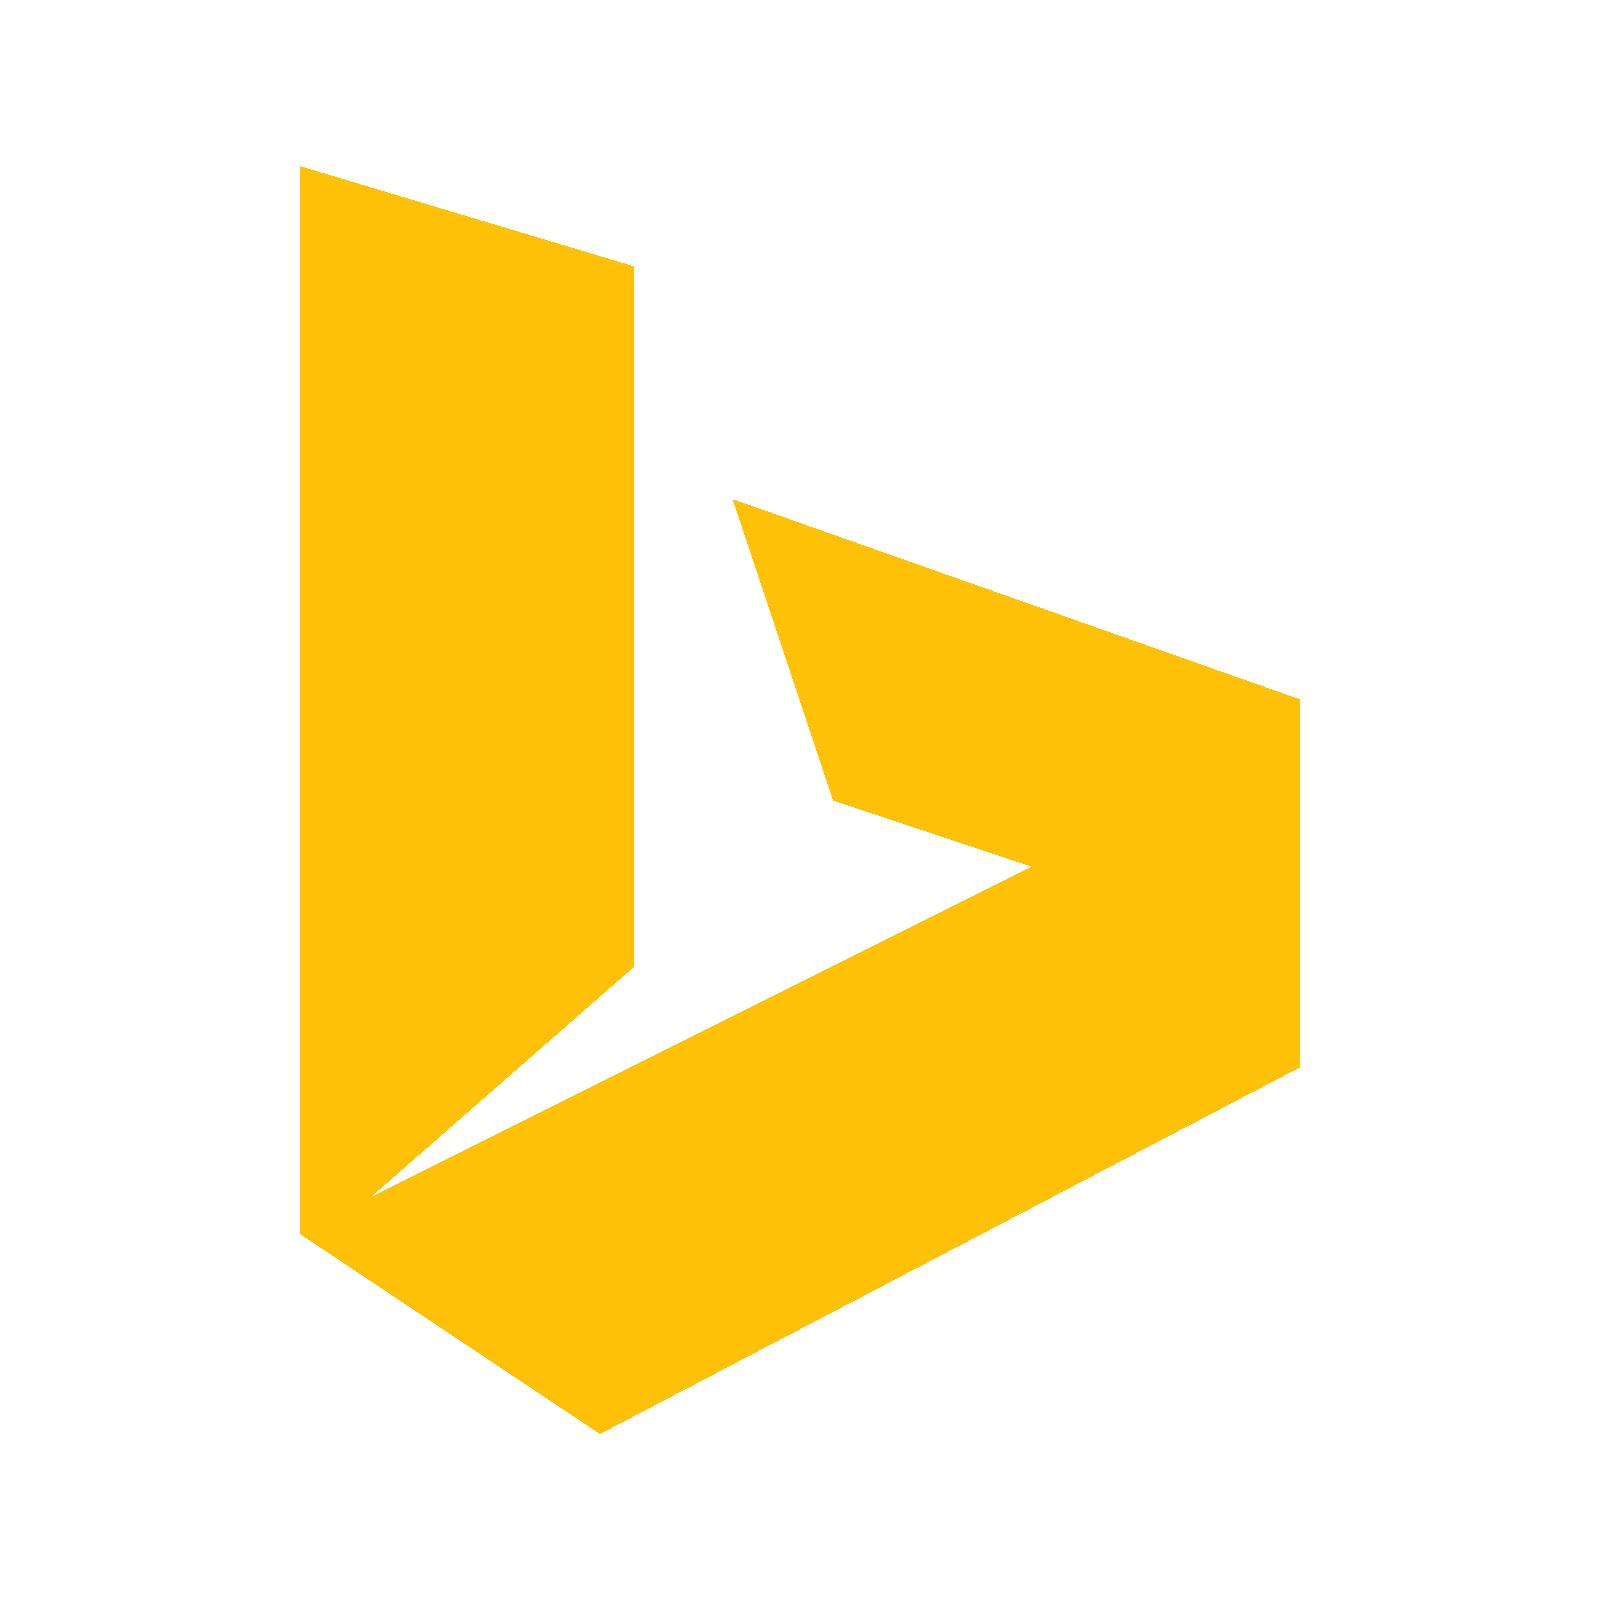 Bing Icon - Bing, Transparent background PNG HD thumbnail